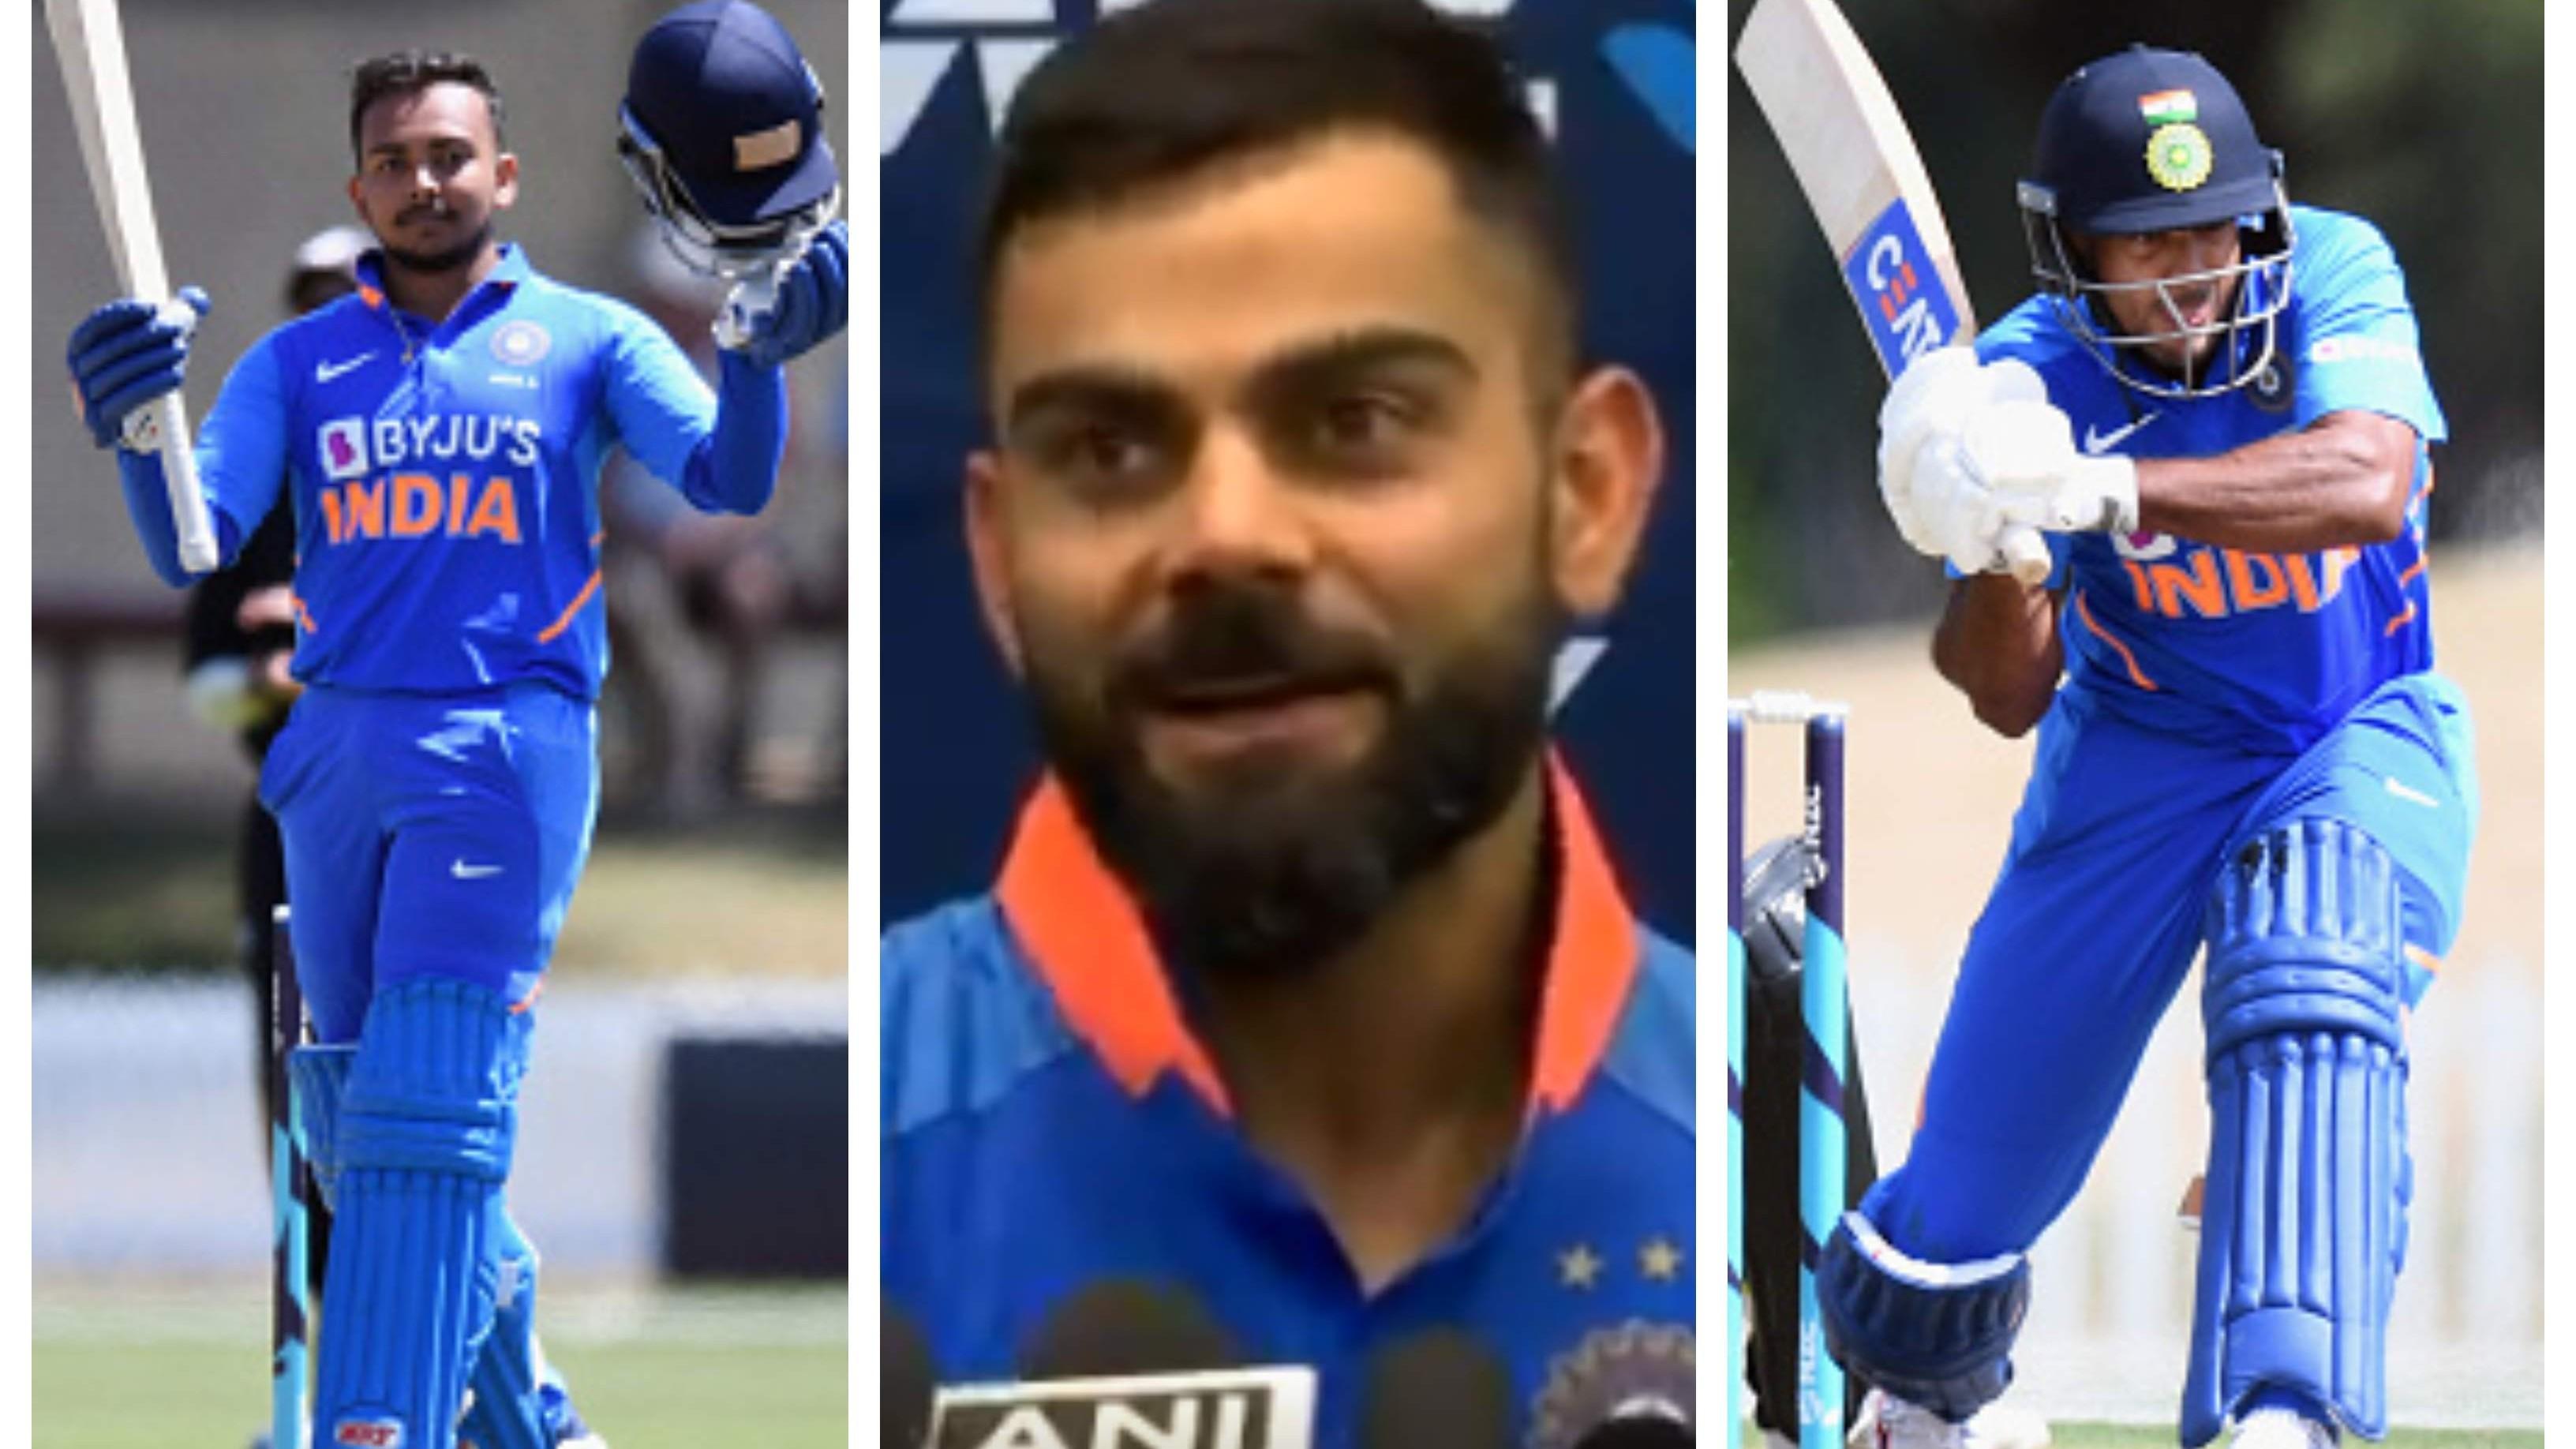 NZ v IND 2020: Shaw, Agarwal to make ODI debuts as openers in Hamilton ODI, confirms Virat Kohli